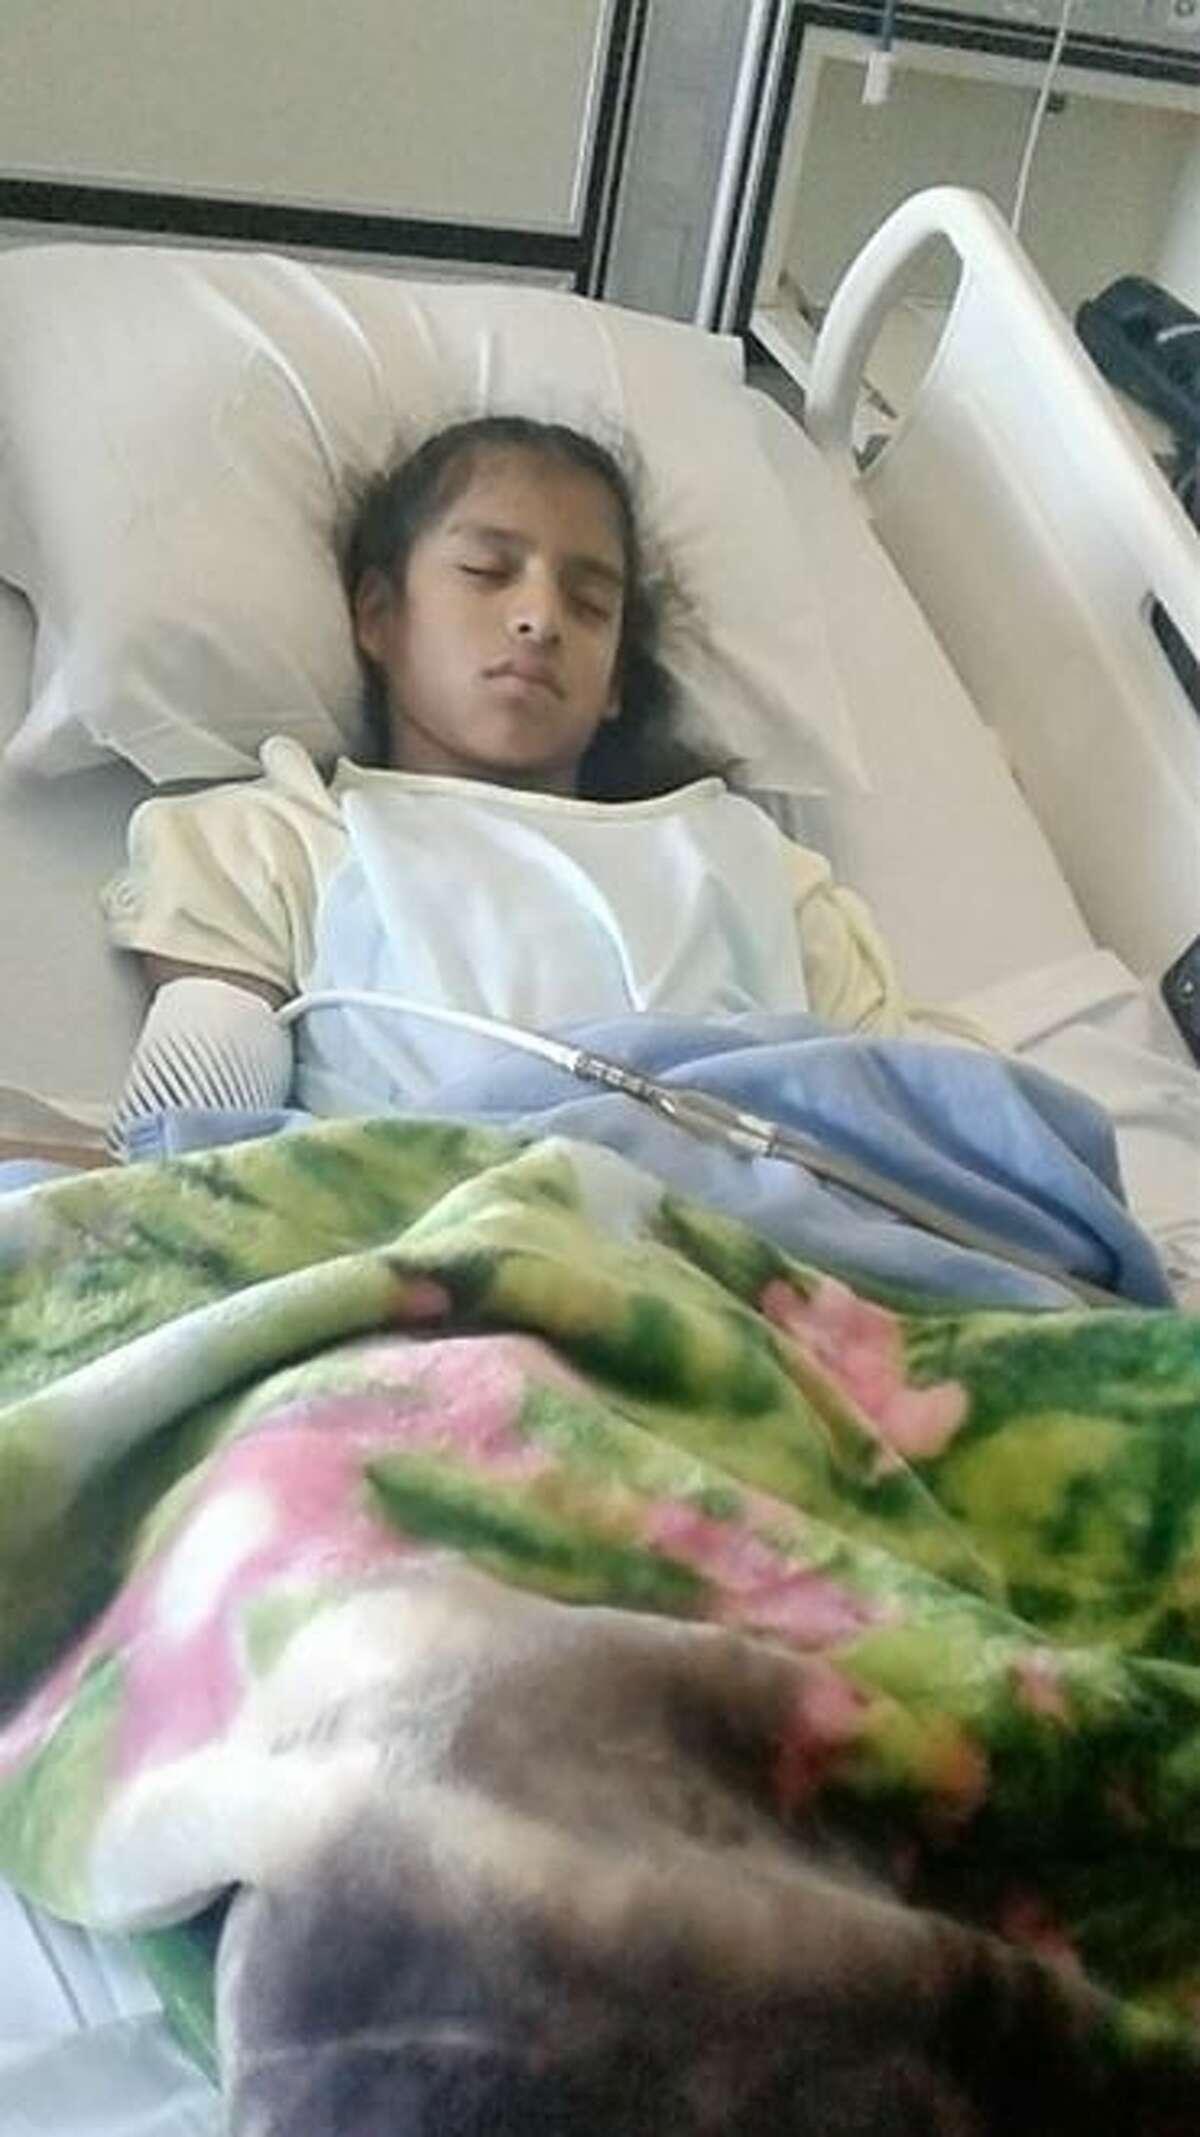 Rosemarie Hernandez, 10, underwent gall bladder surgery in Corpus Christi.